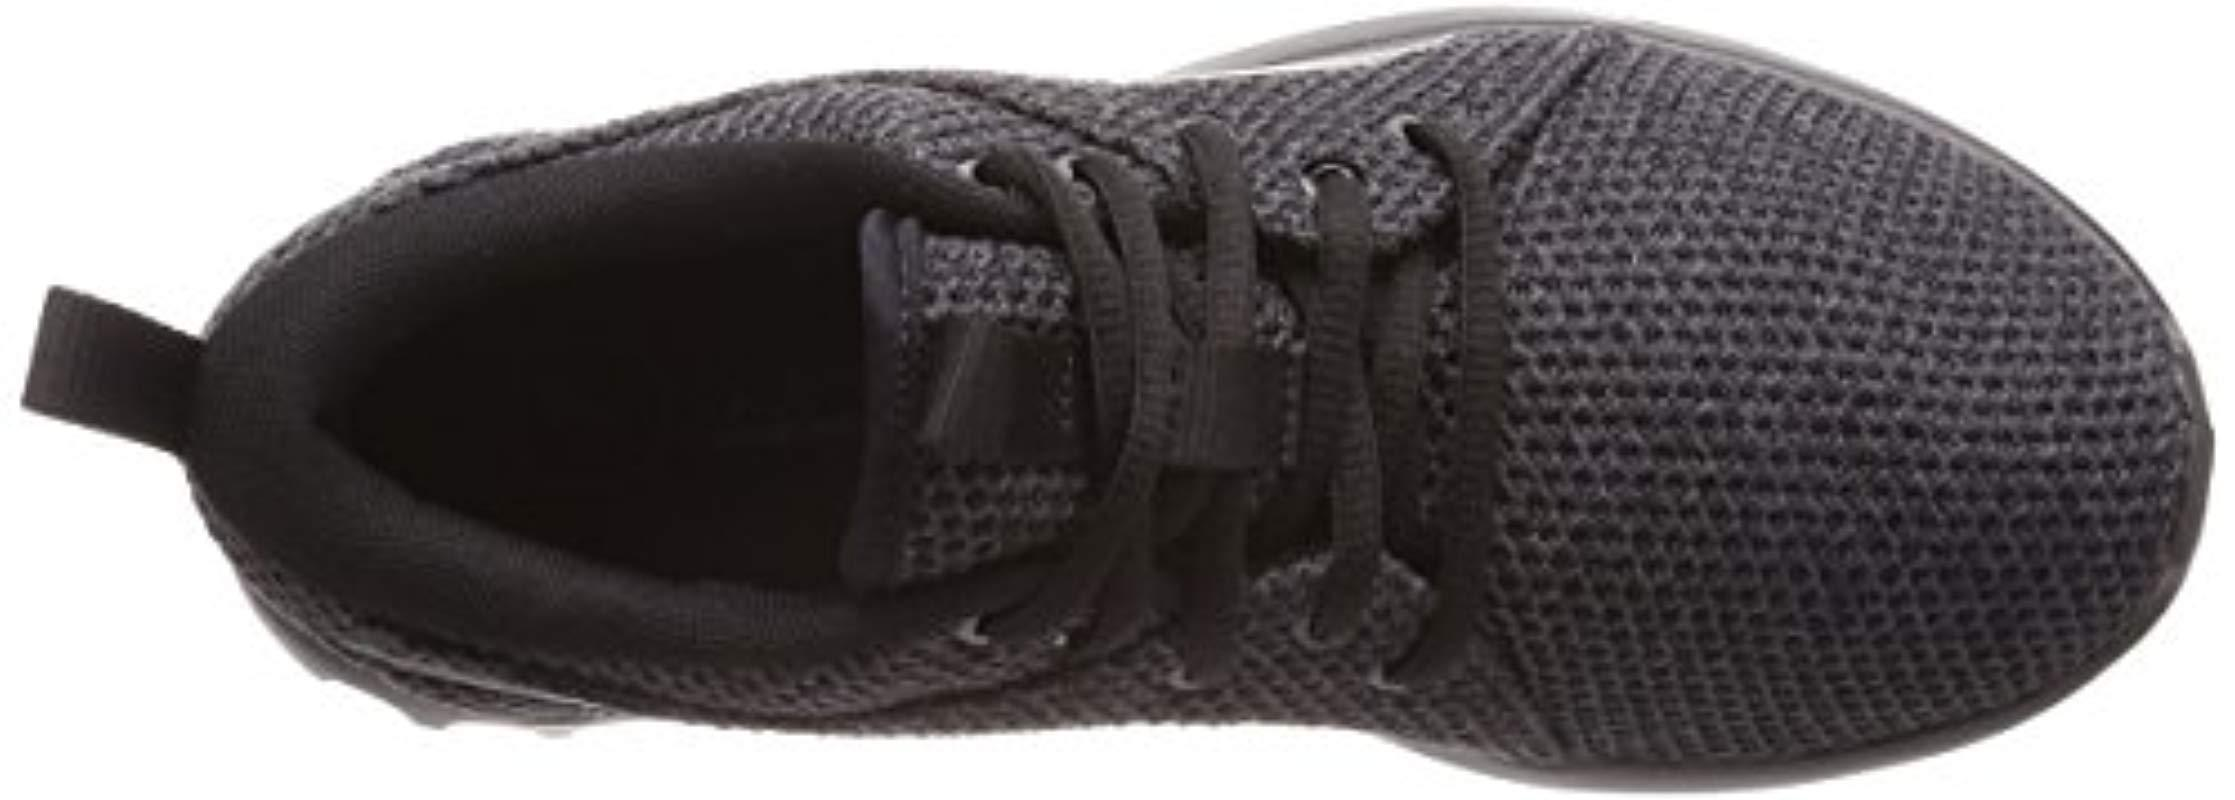 PUMA - Black Carson 2 Nature Knit Wn s Cross Trainers - Lyst. View  fullscreen 734c81330